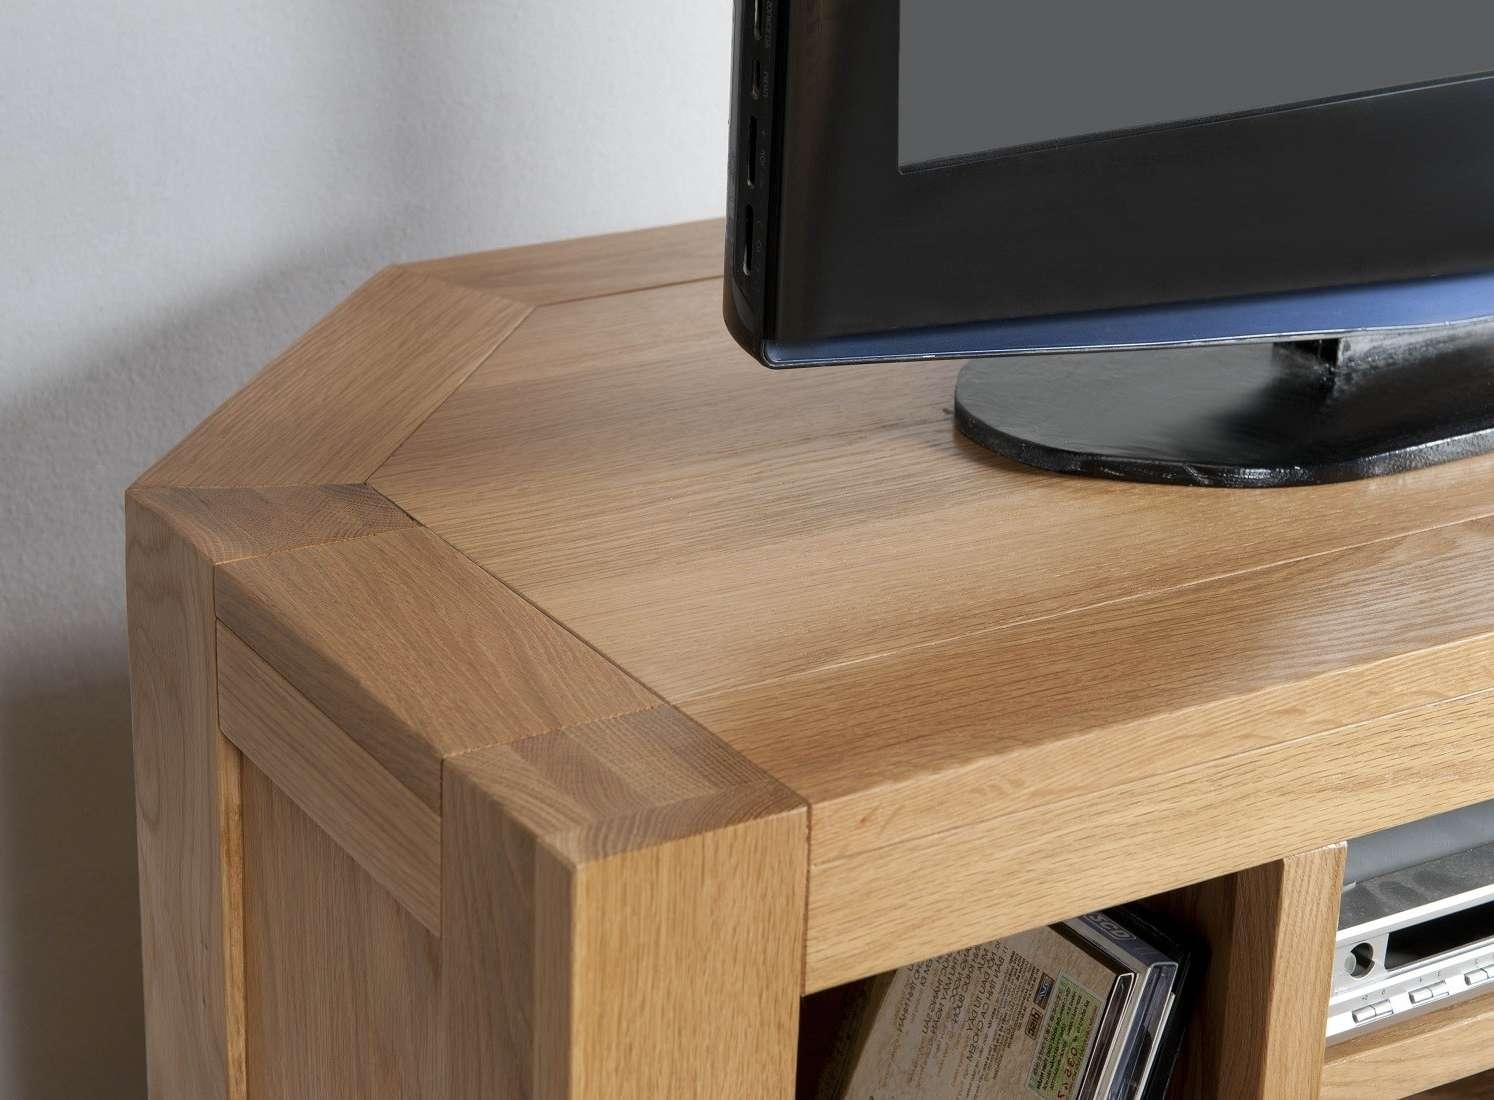 Aylesbury Contemporary Light Oak Corner Tv Unit | Oak Furniture Uk With Regard To Light Oak Corner Tv Cabinets (View 13 of 20)